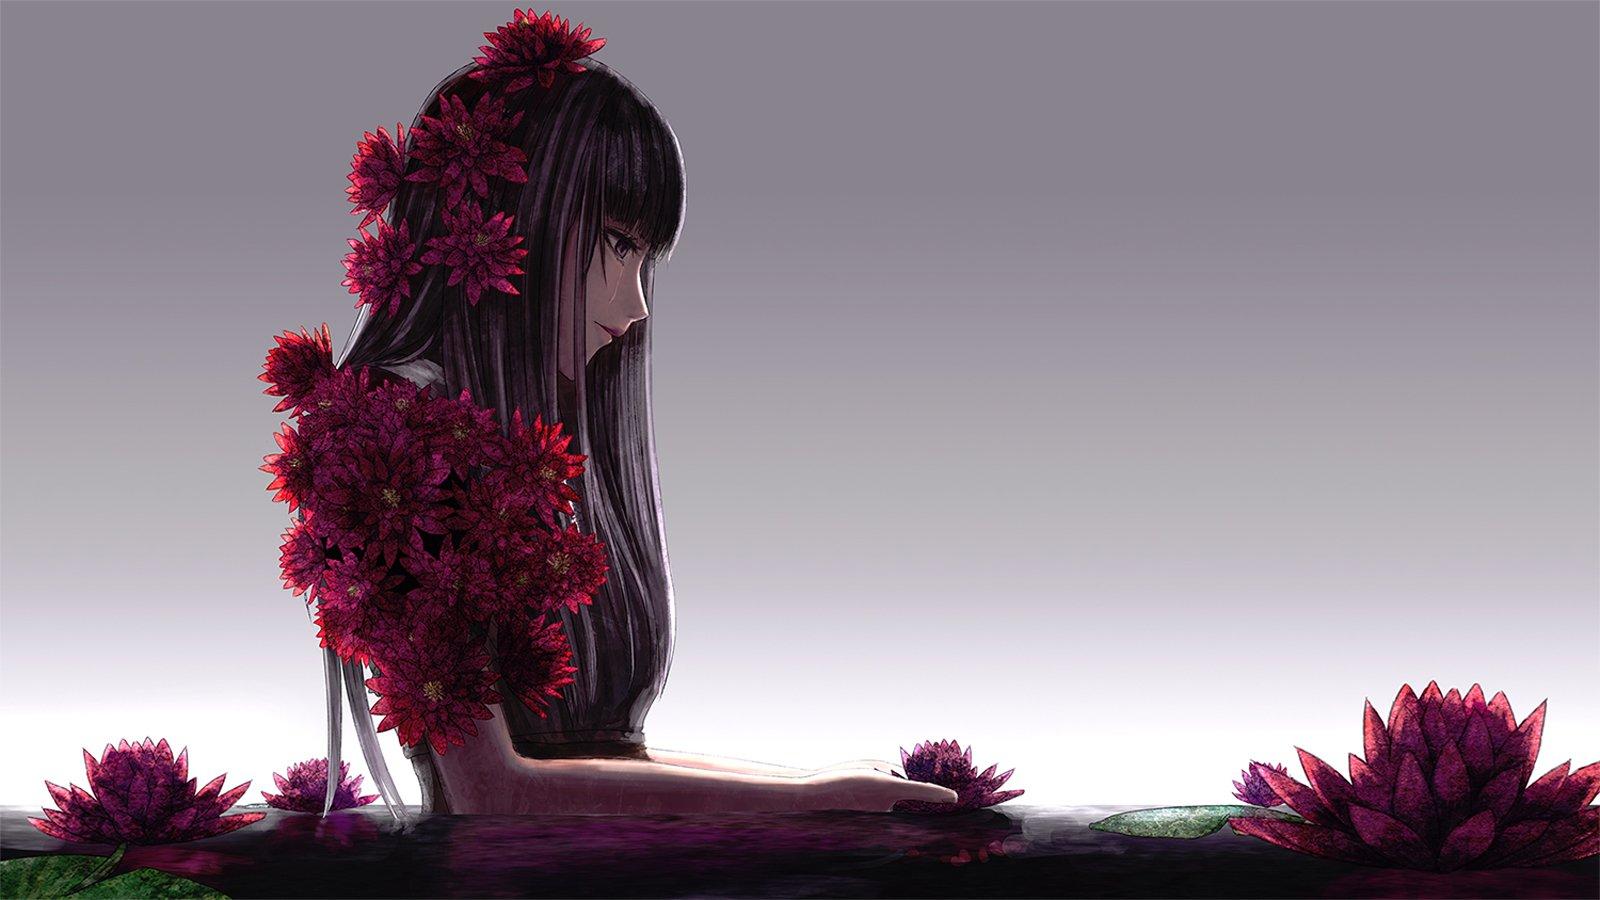 Free Download Girl Wallpaper For 360x640 Alone Anime Girl Hd Wallpaper 21321 Baltana